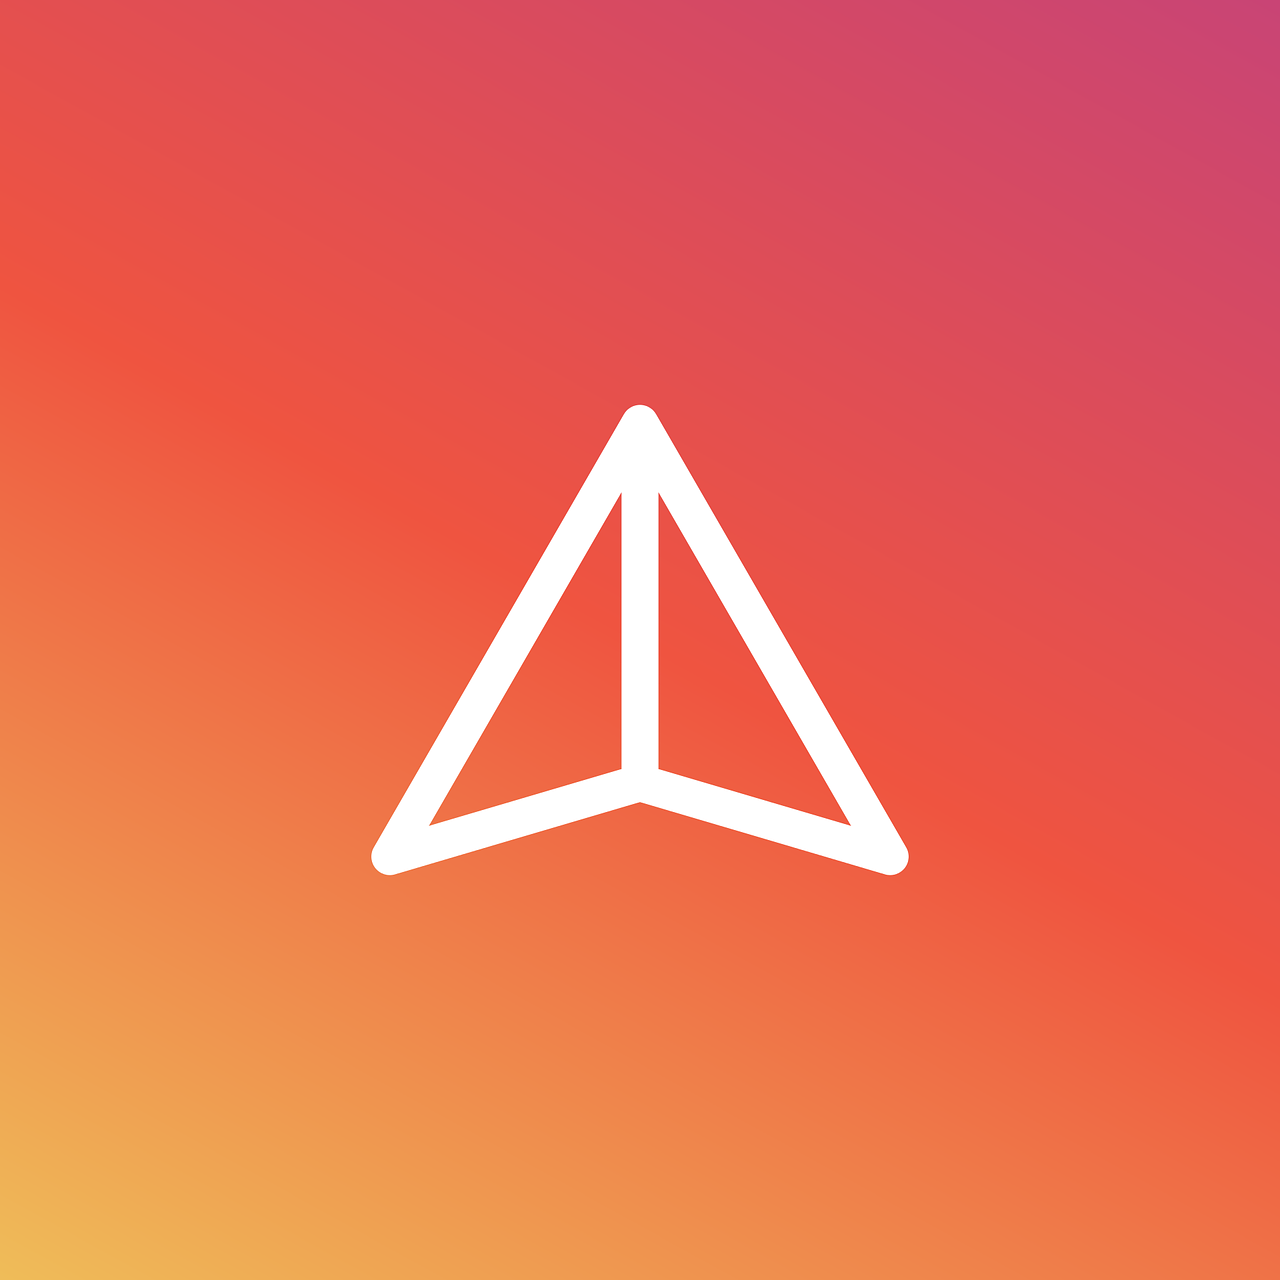 Does Instagram Notify When You Screenshot A DM? / Blastup